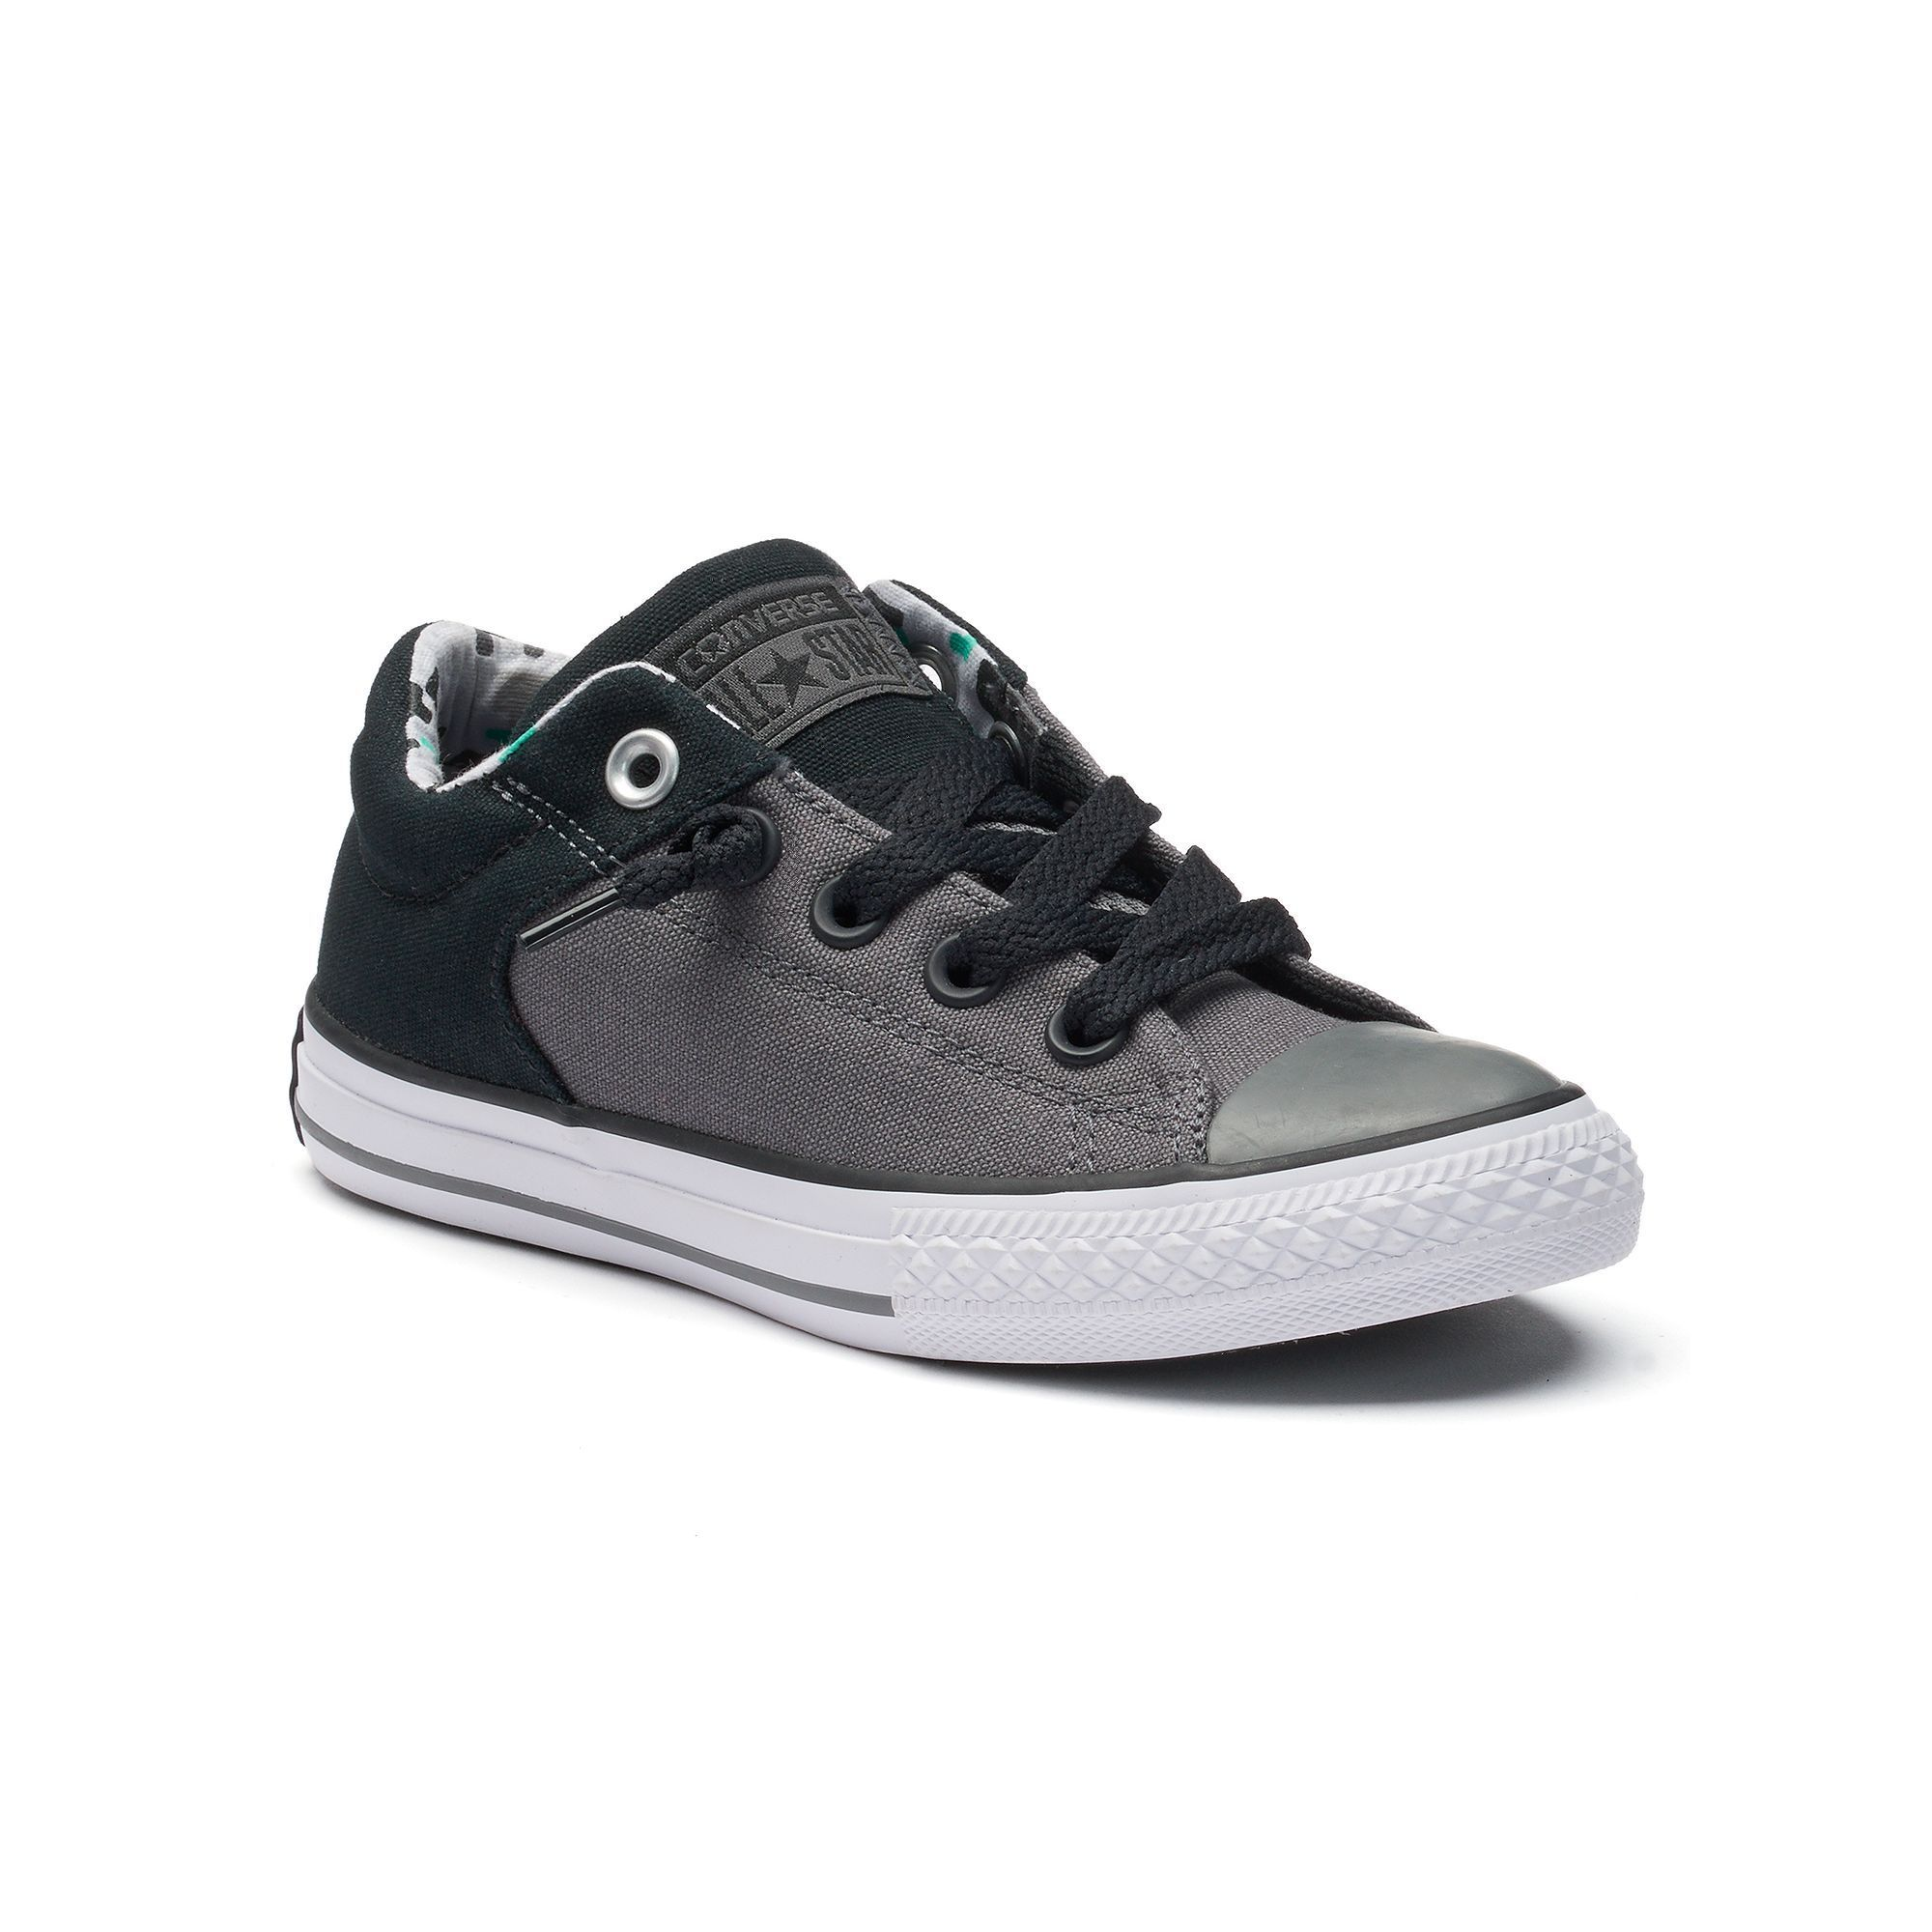 converse chuck taylor size 3